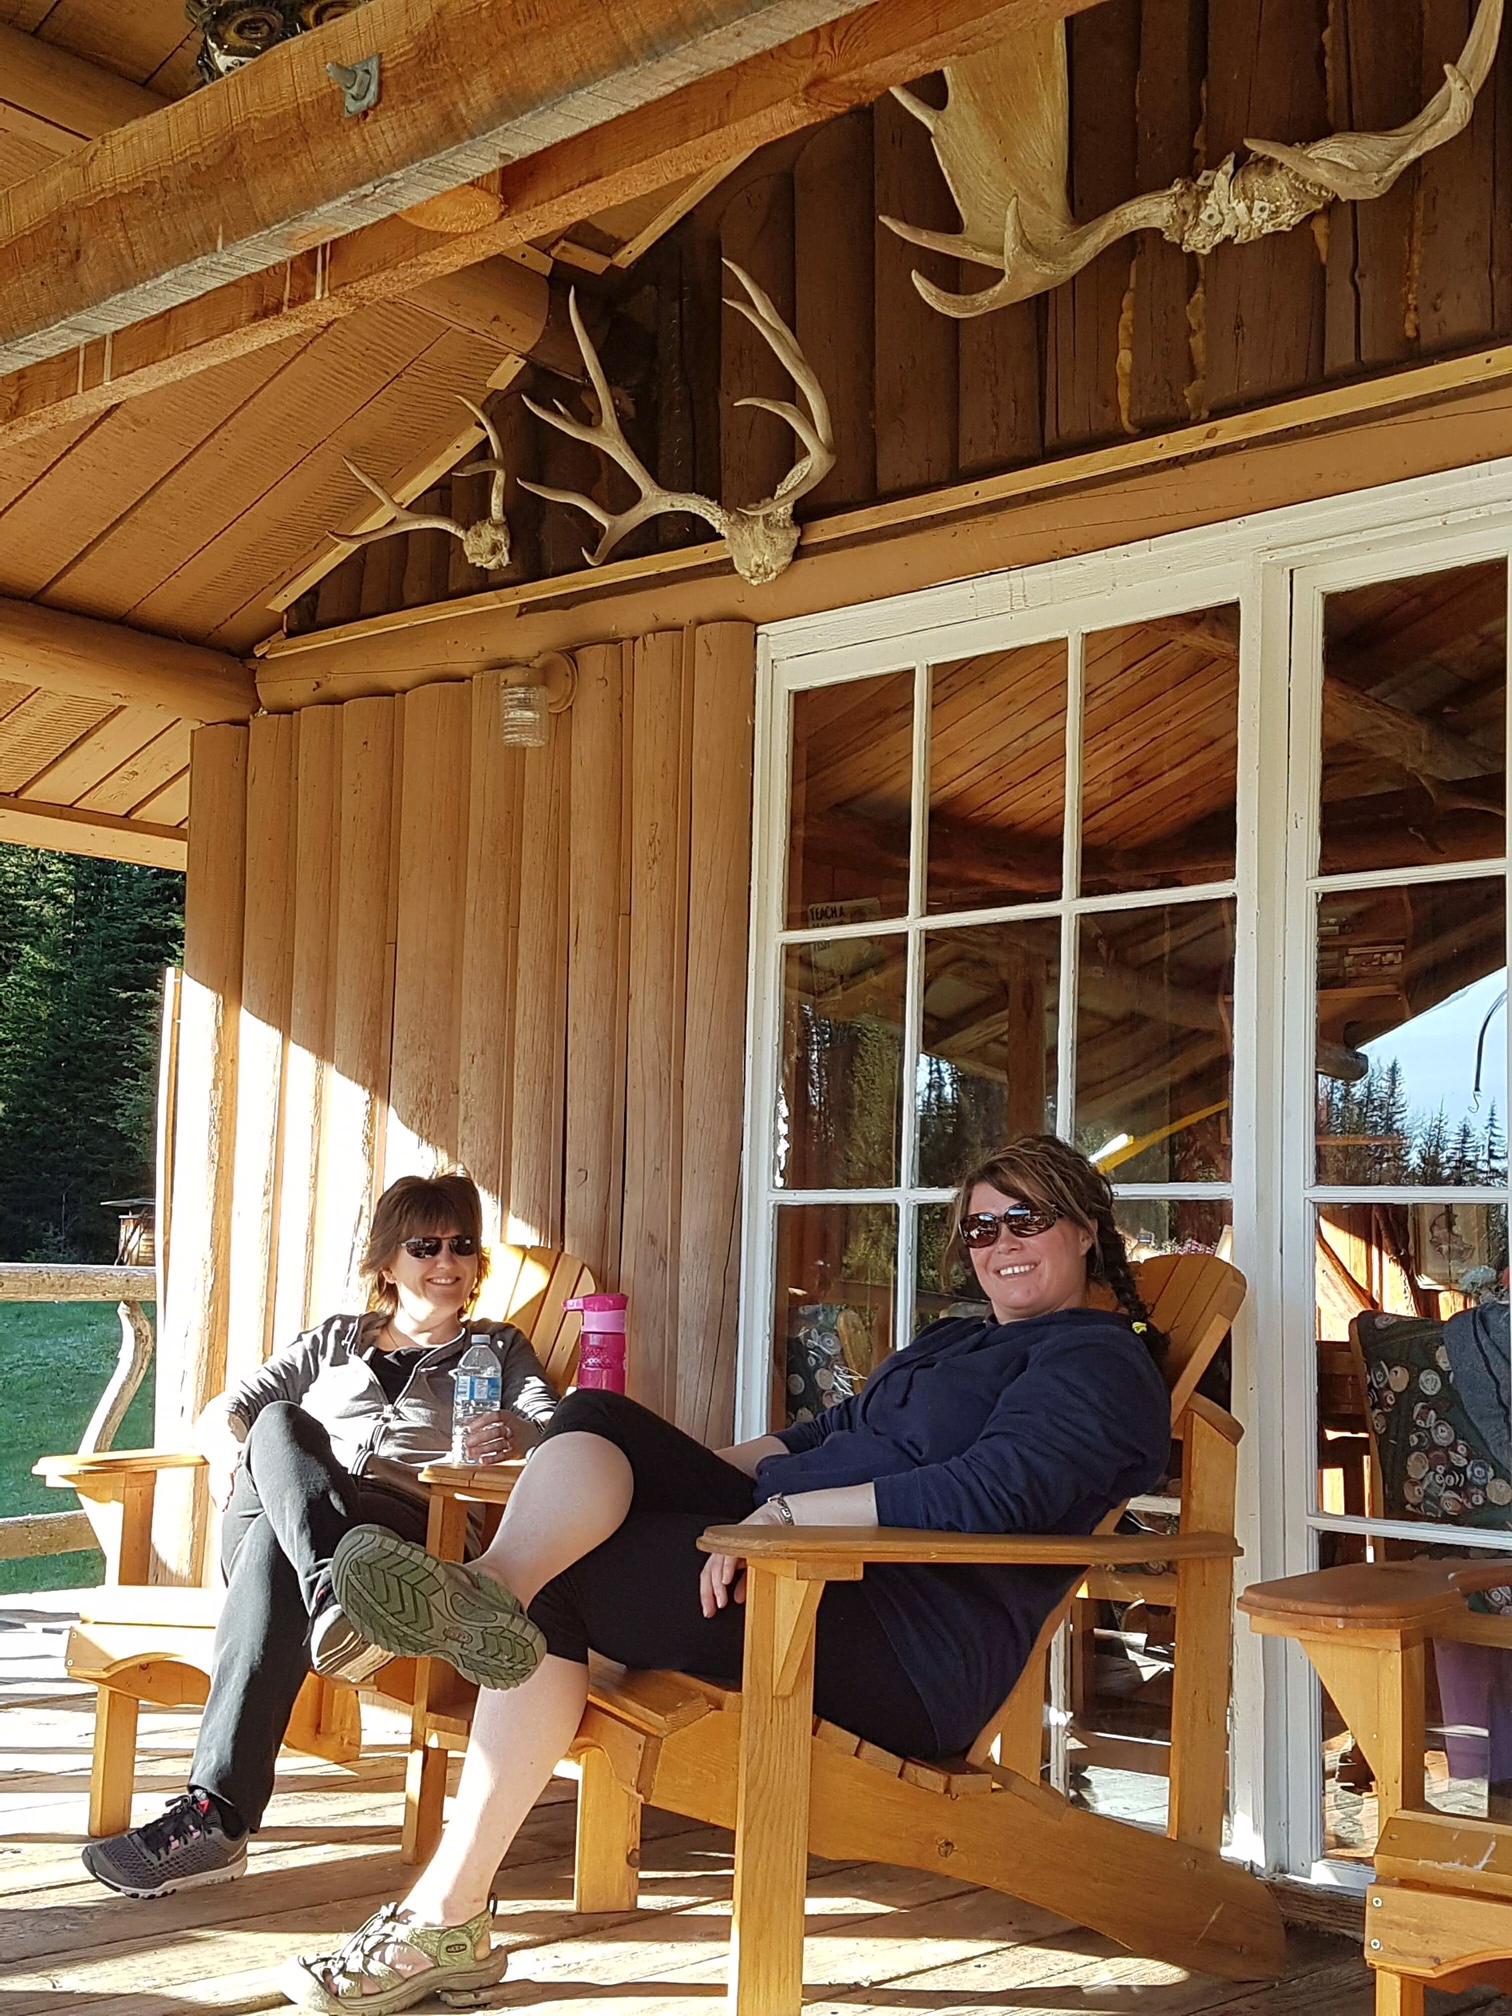 Unwind on the Porch